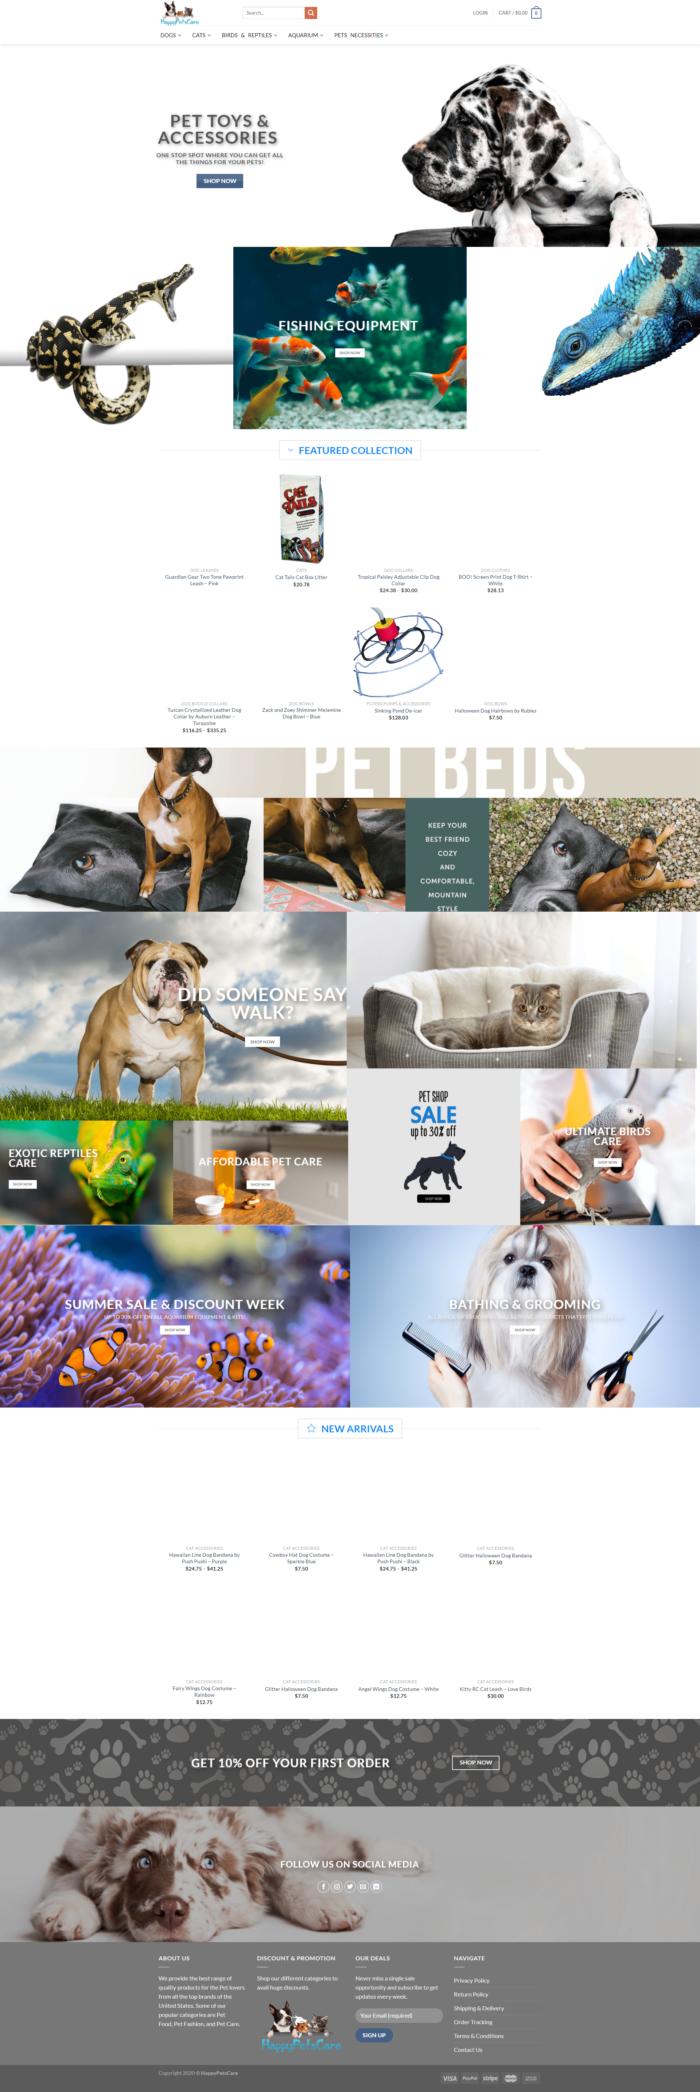 Happy Pets Care – Latest Pet Accessories